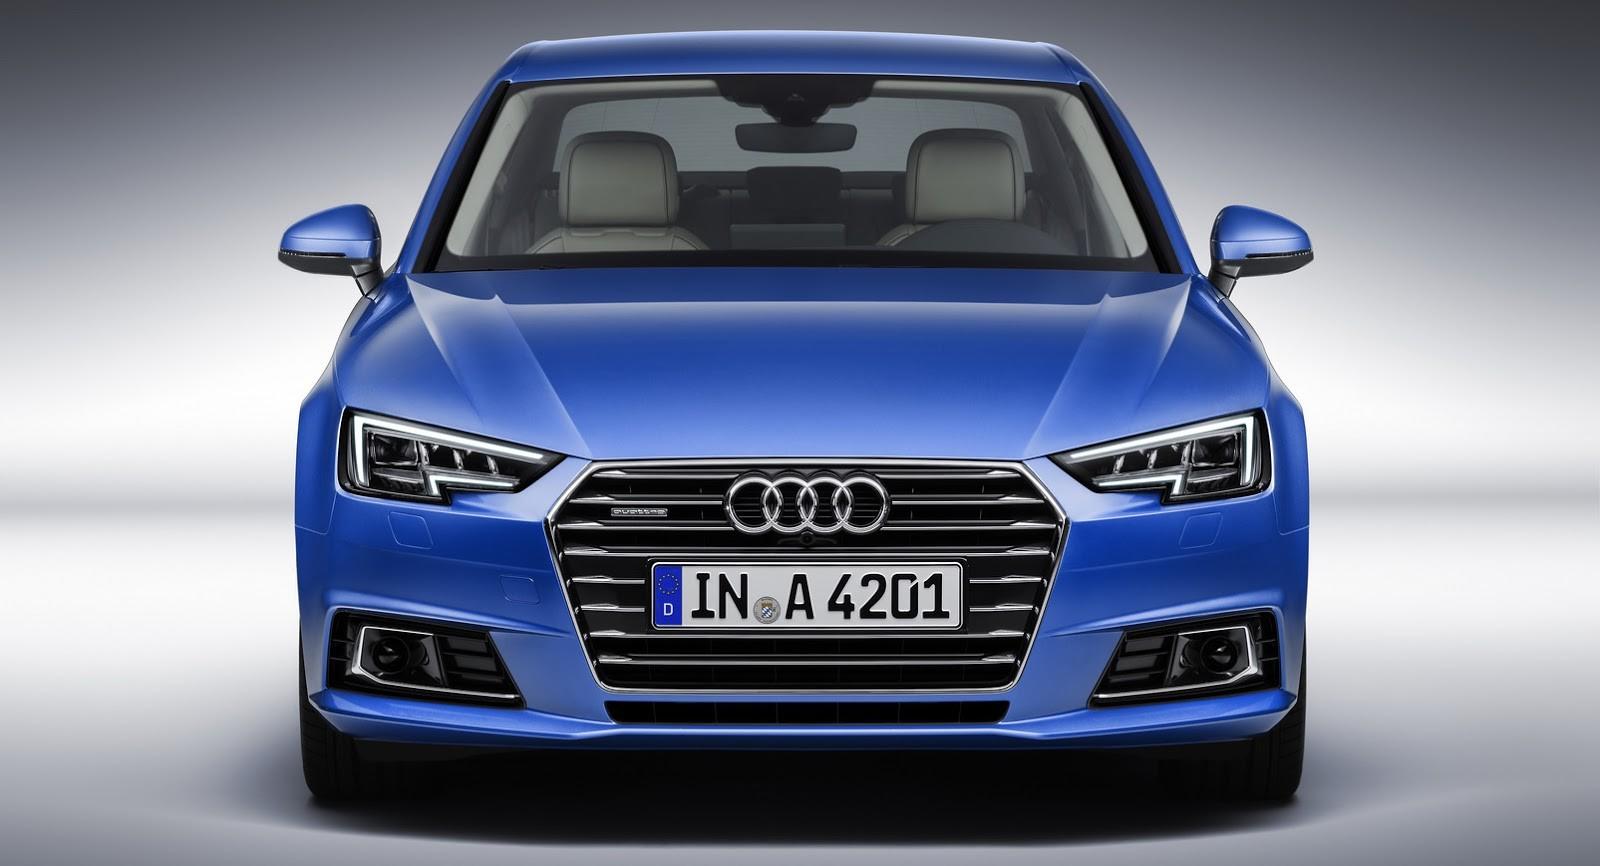 Audi представила удлинённый седан A4 L